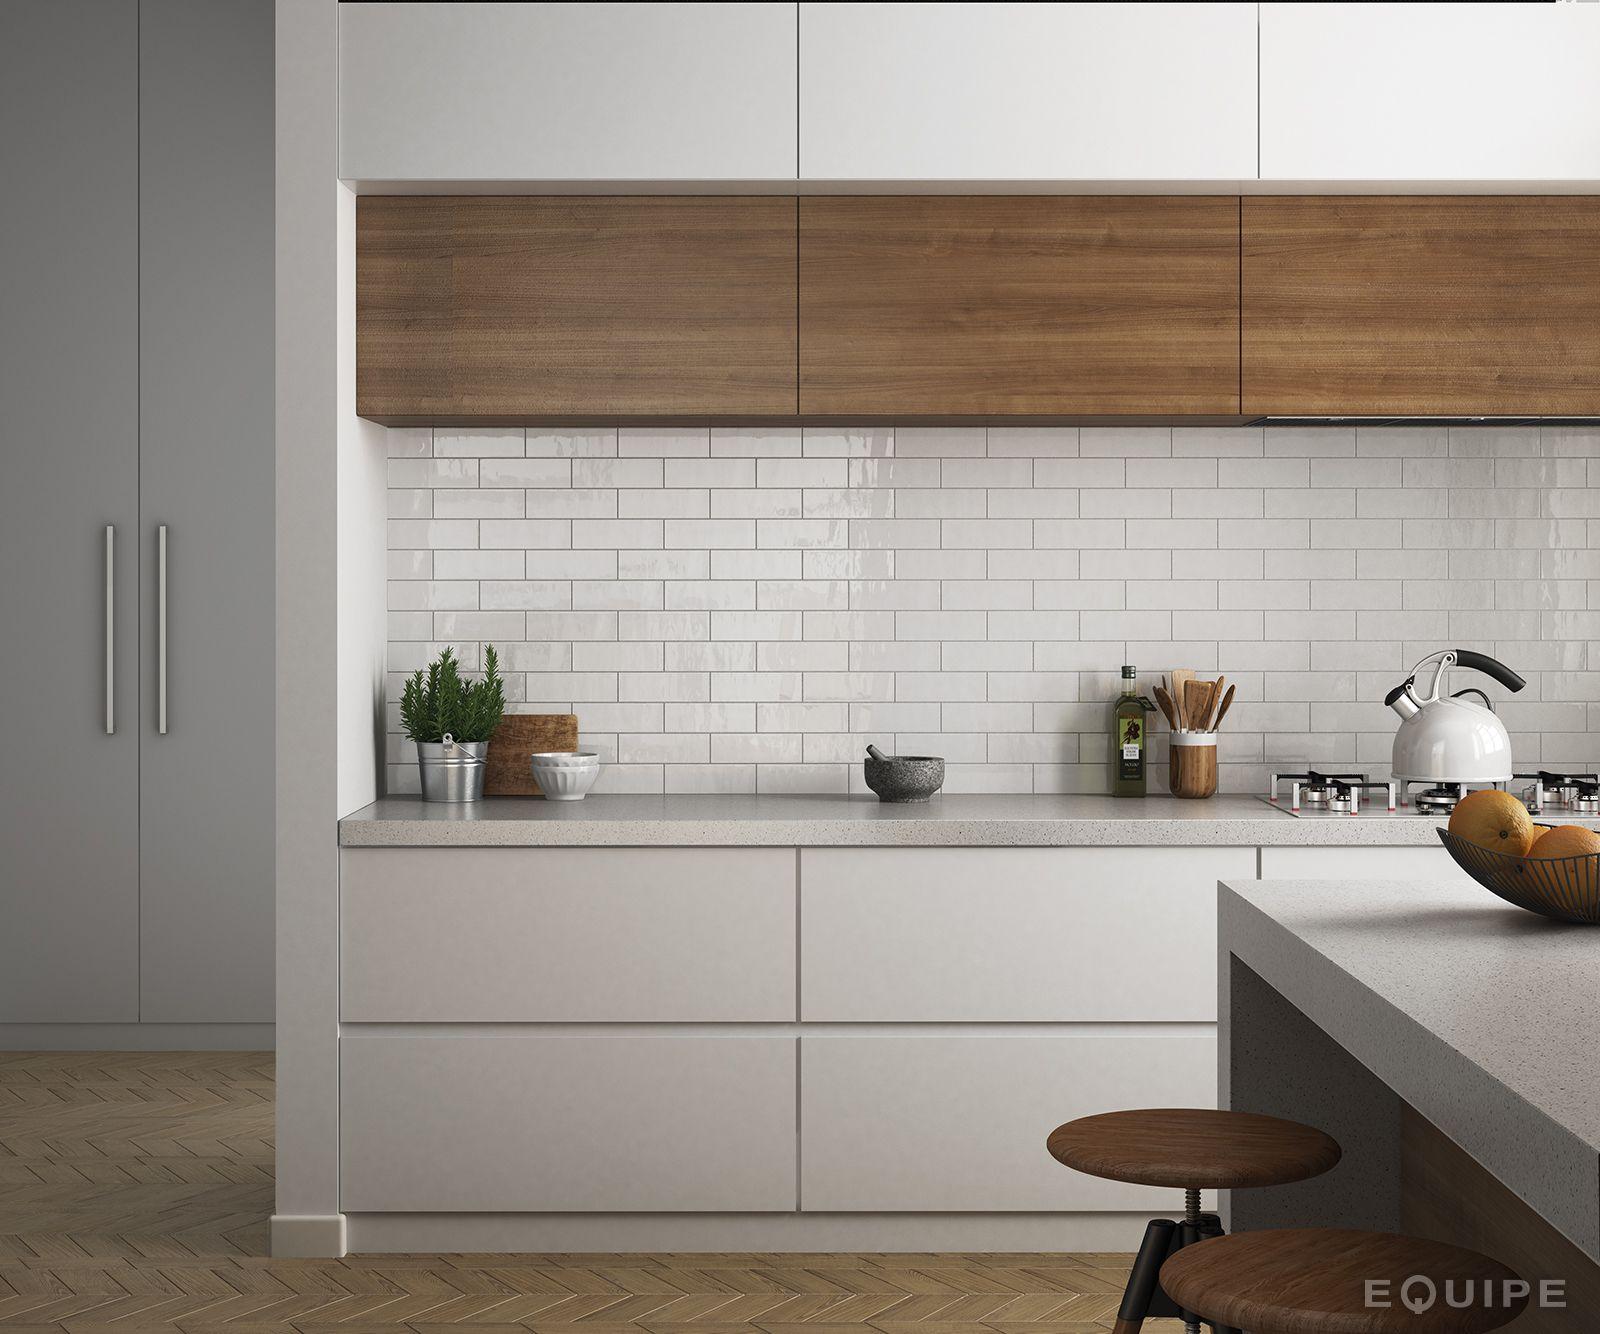 Kitchen Tiles Modern country blanco 6,5x20. #architecture, #architect, #bath, #bathroom